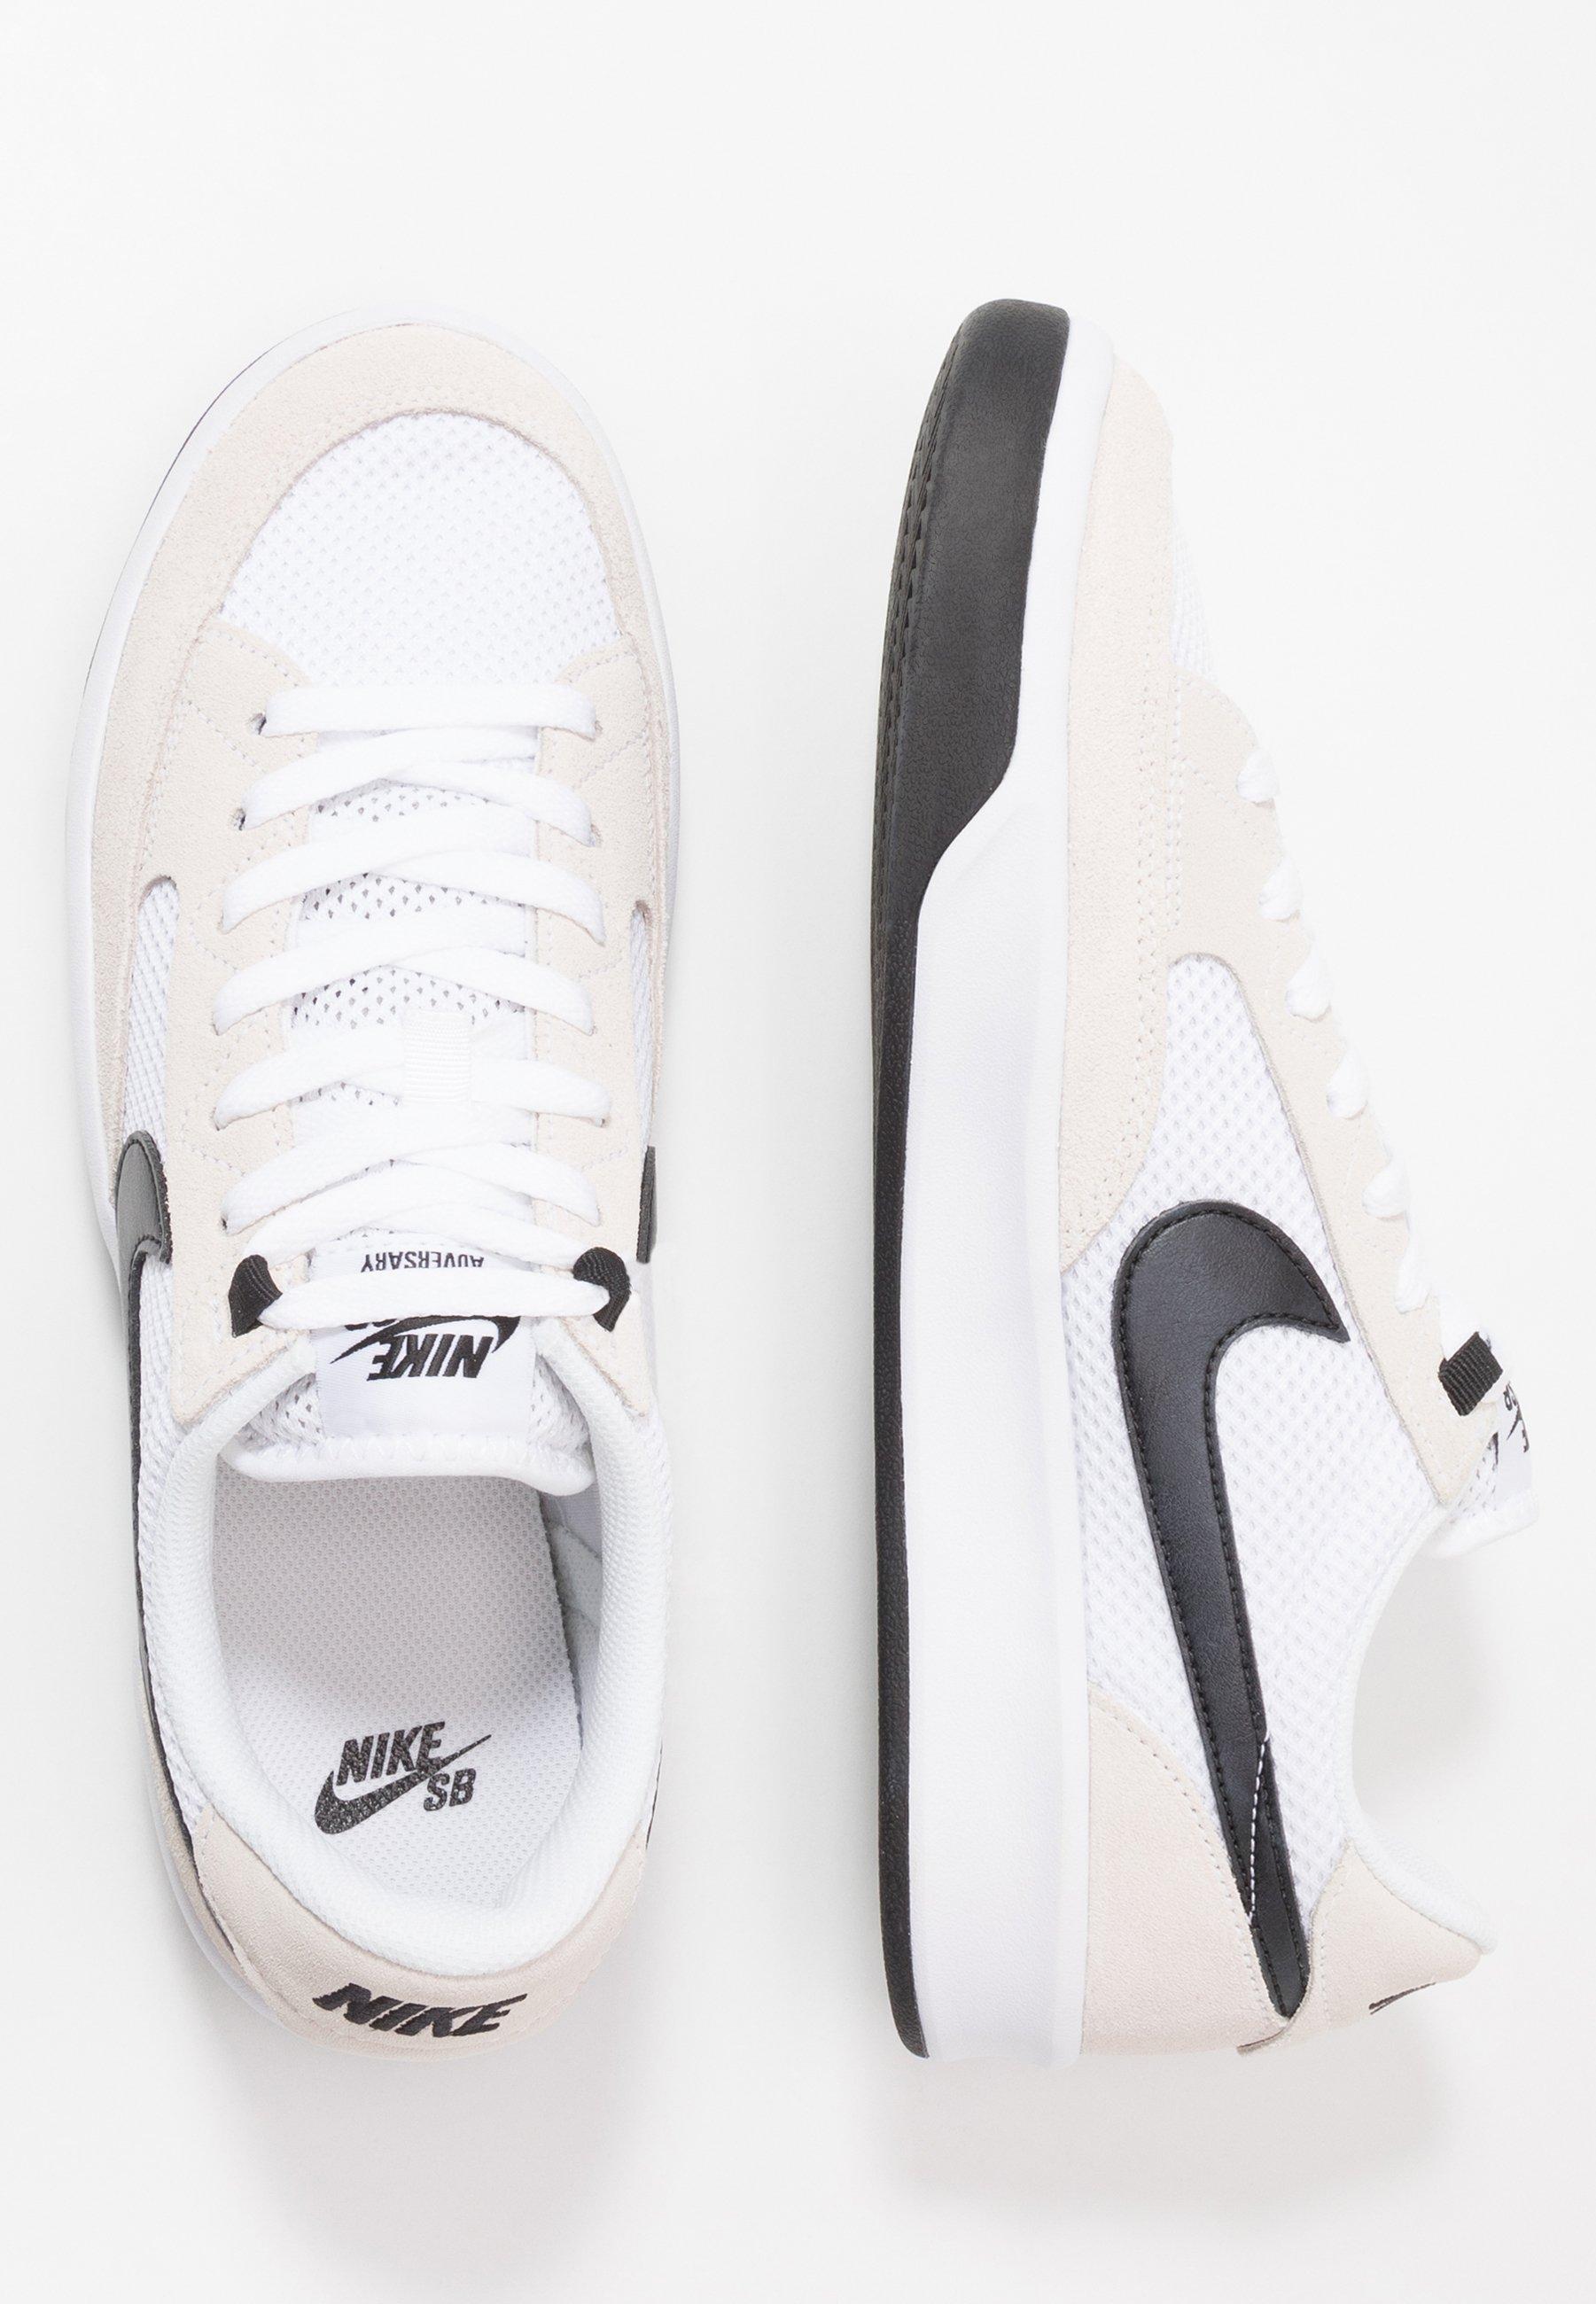 ADVERSARY Chaussures de skate whiteblack